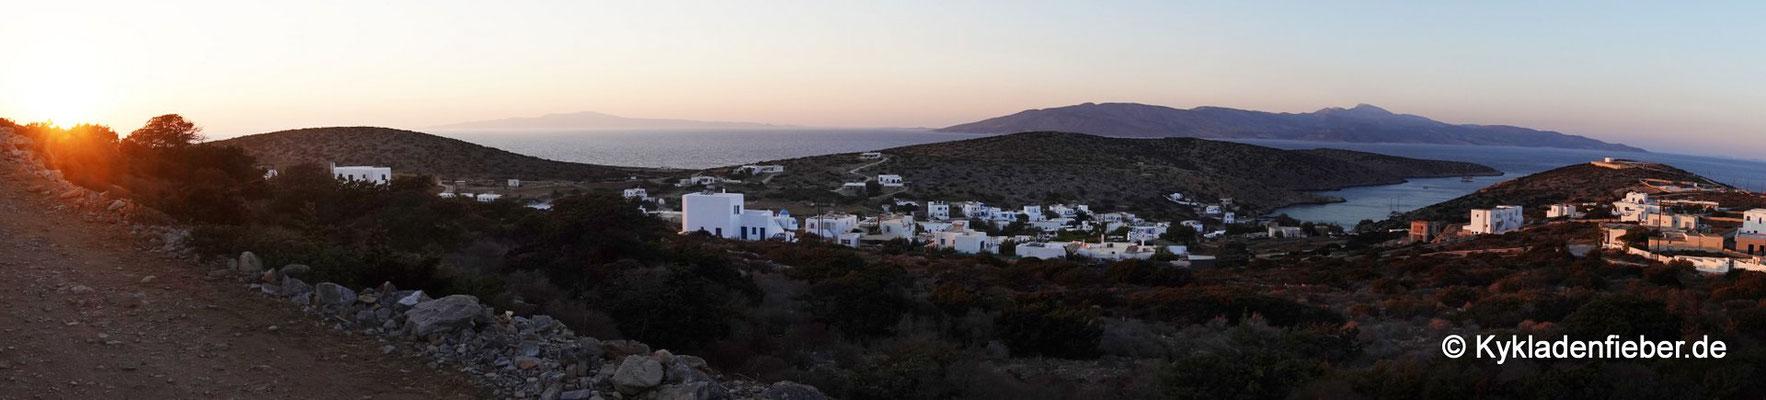 Iraklia, Blick auf Agios Georgios